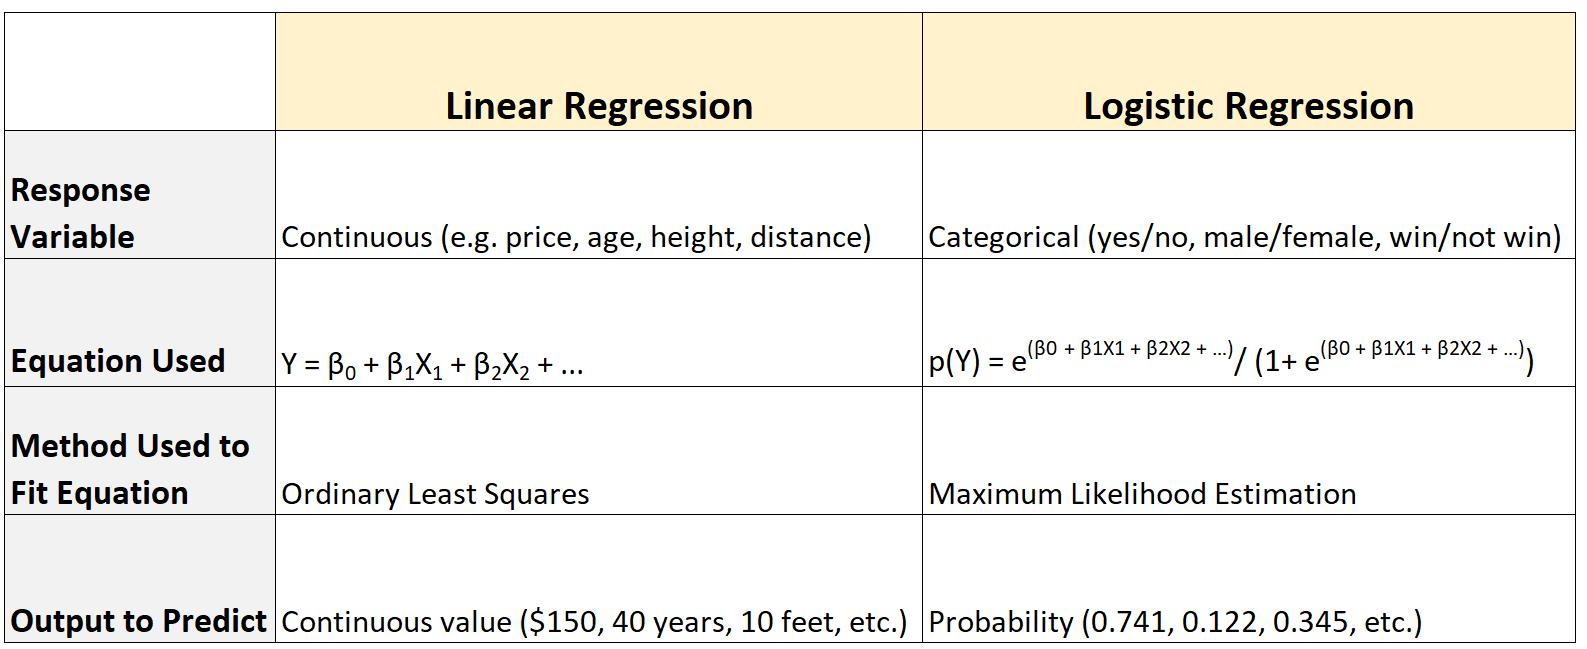 logistic regression vs. linear regression